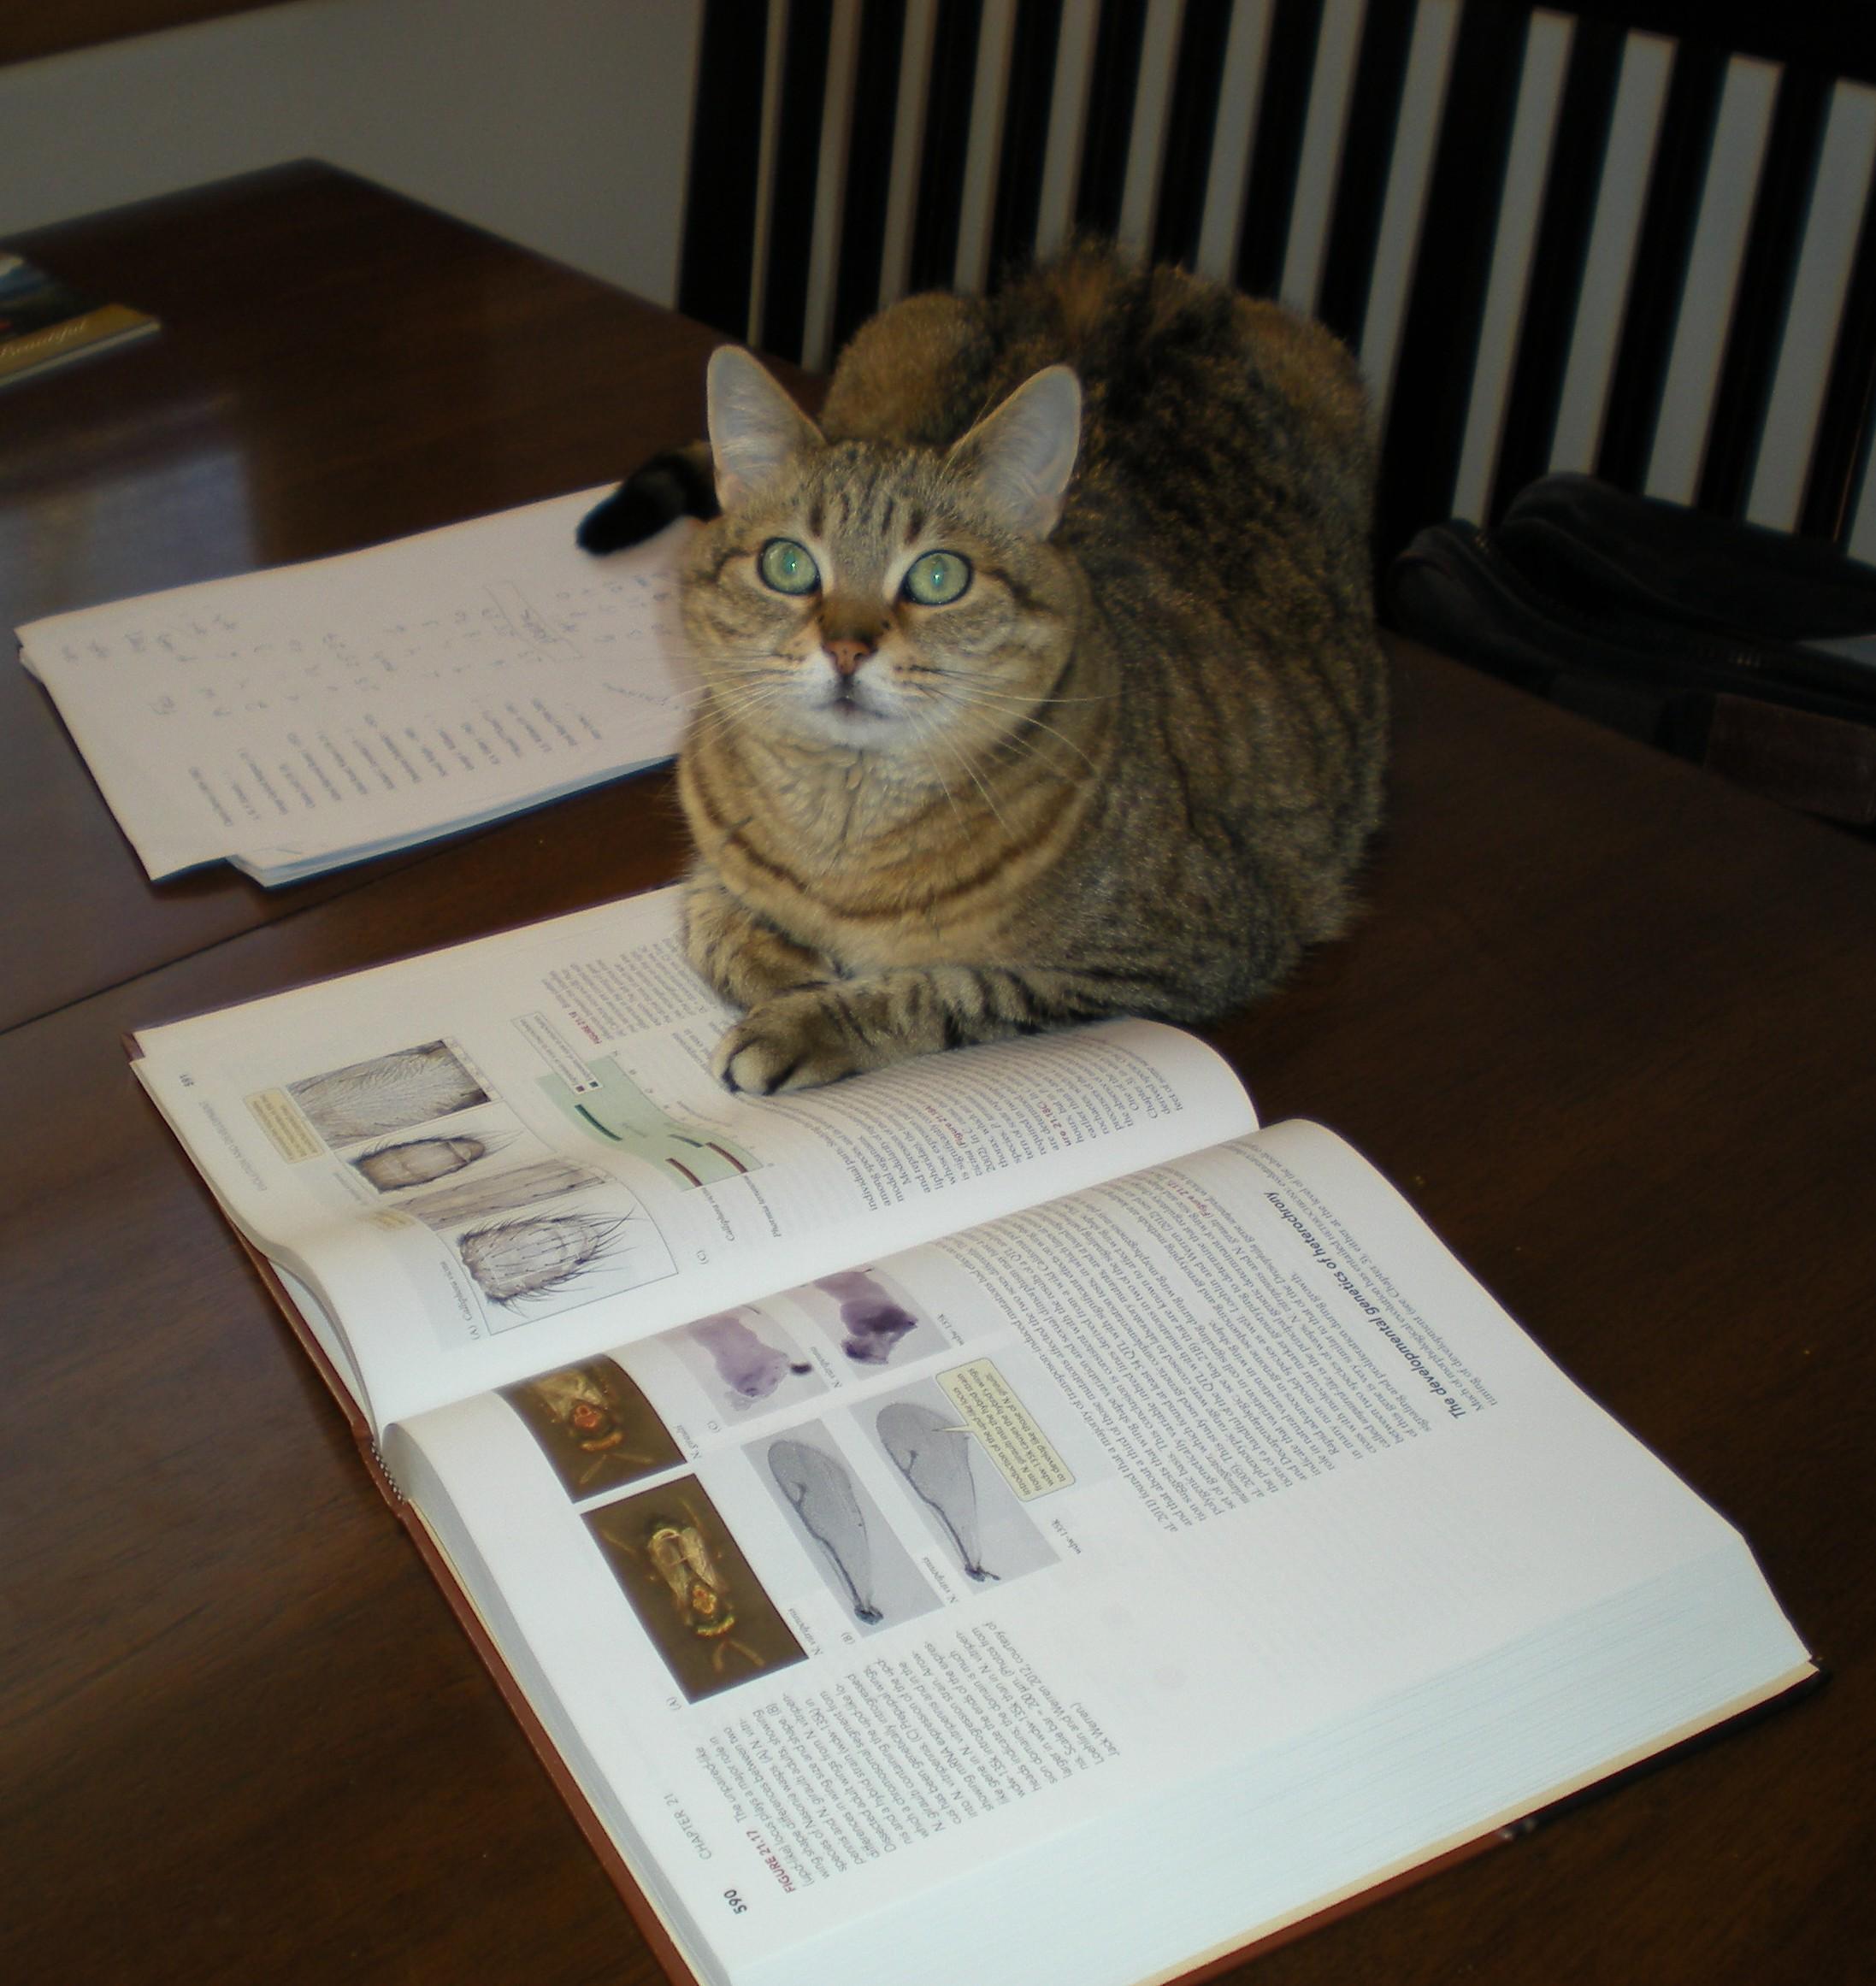 Peyton reading Futuyma